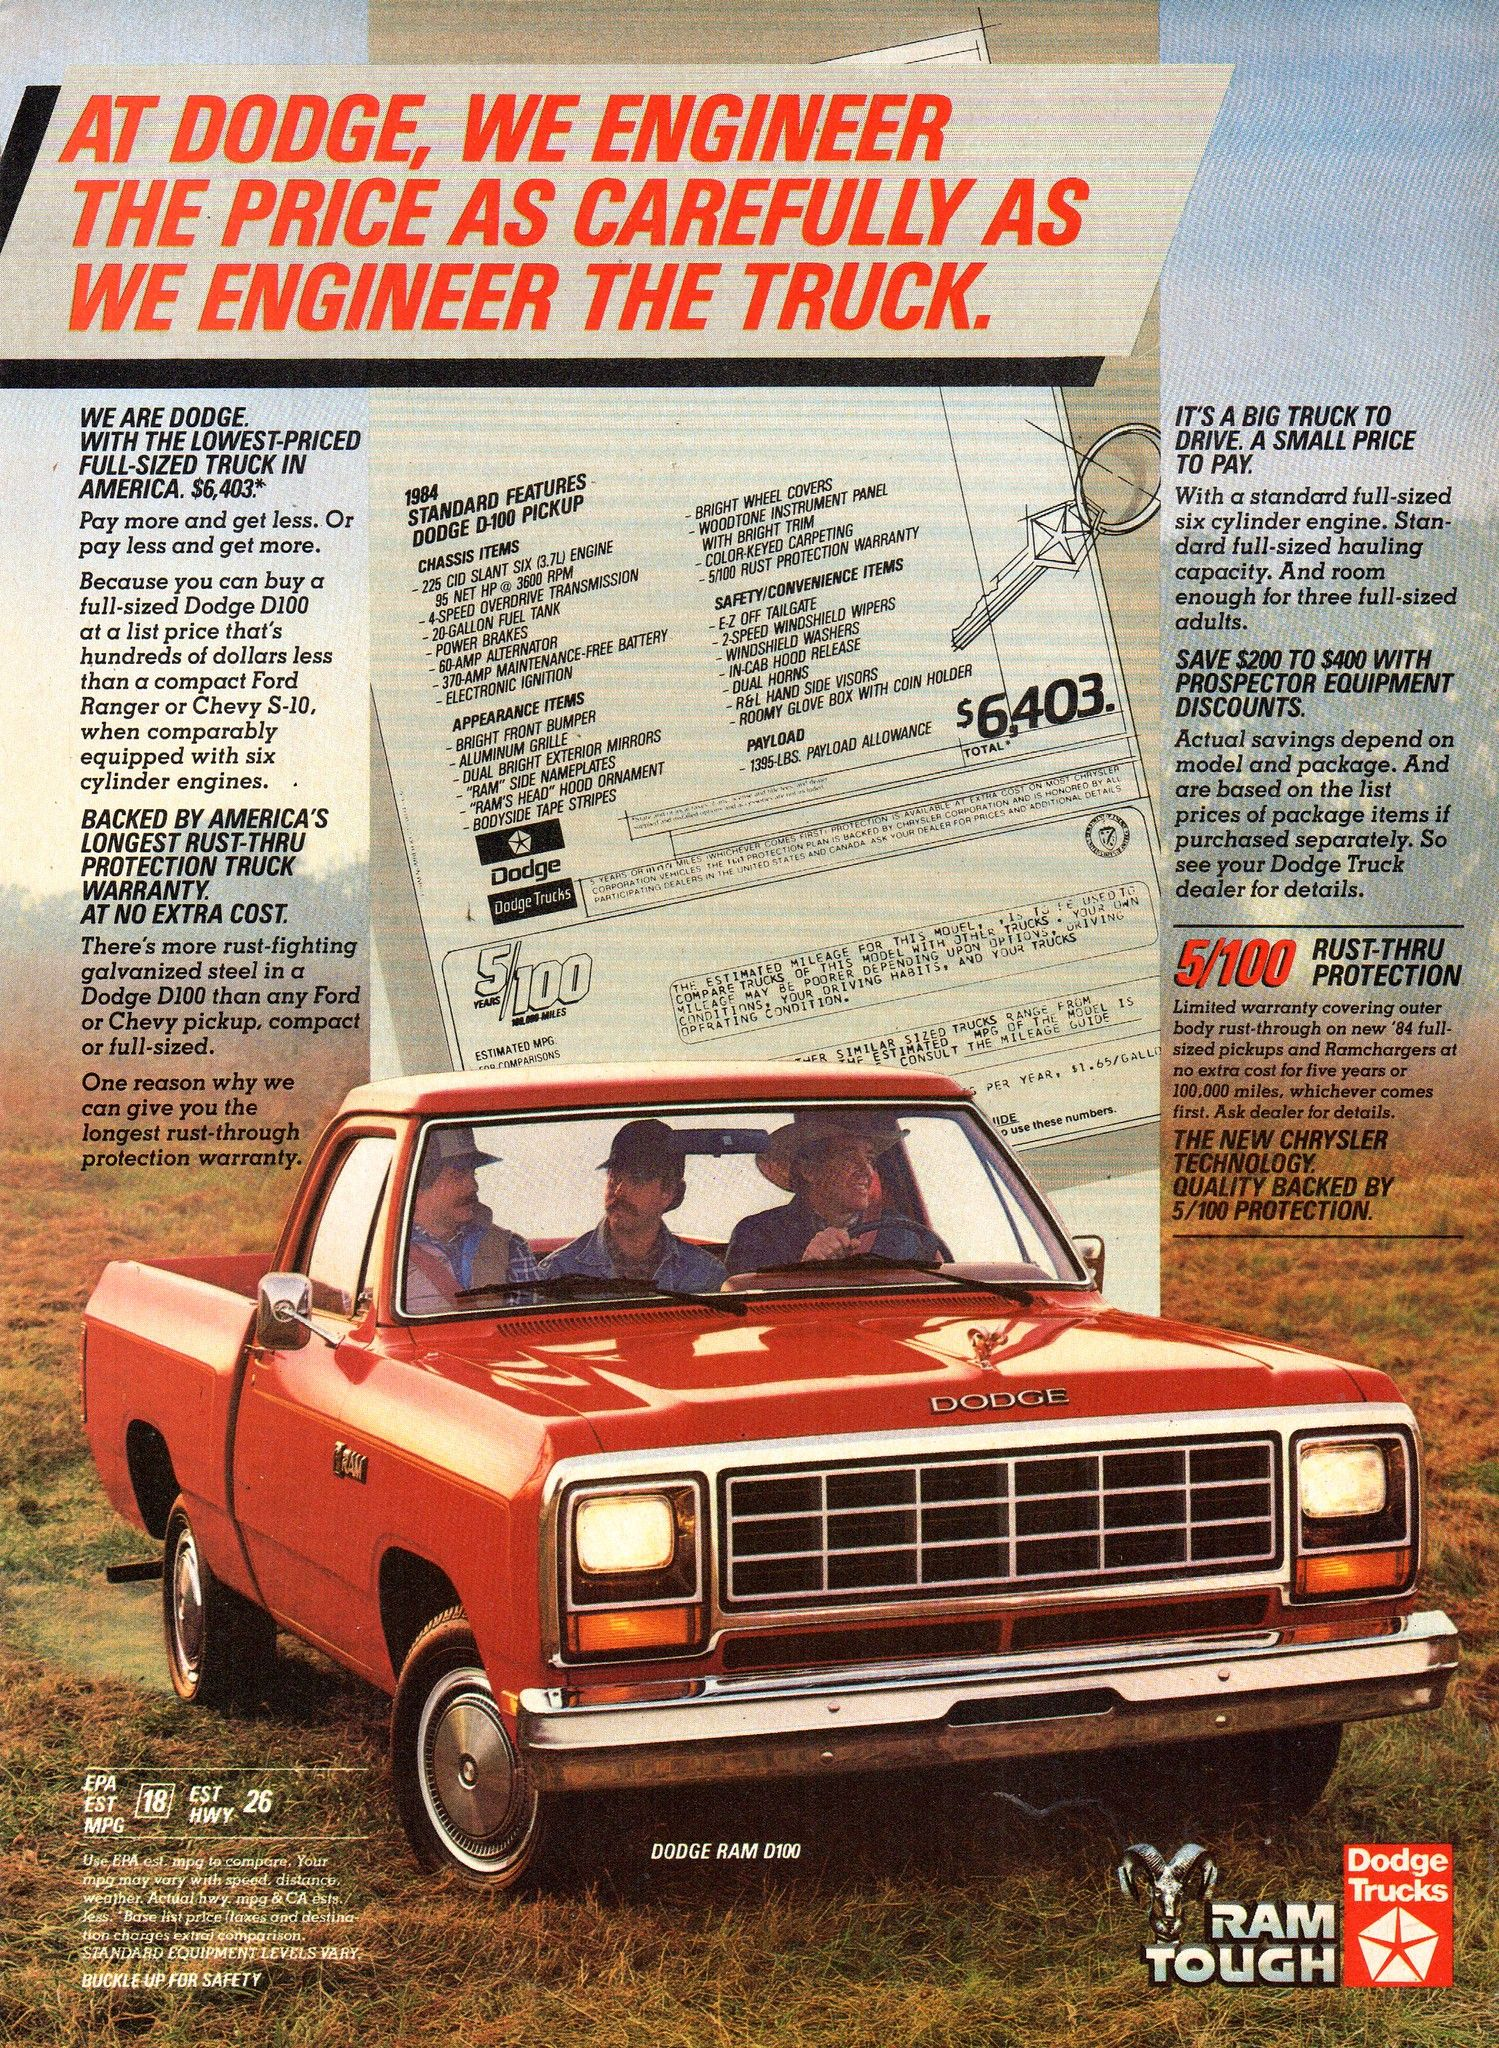 1984 Dodge Ram D100 Pickup Truck Chrysler Corporation Usa Original Magazine Advertisement Vintage Pickup Trucks Old Dodge Trucks Pickup Trucks